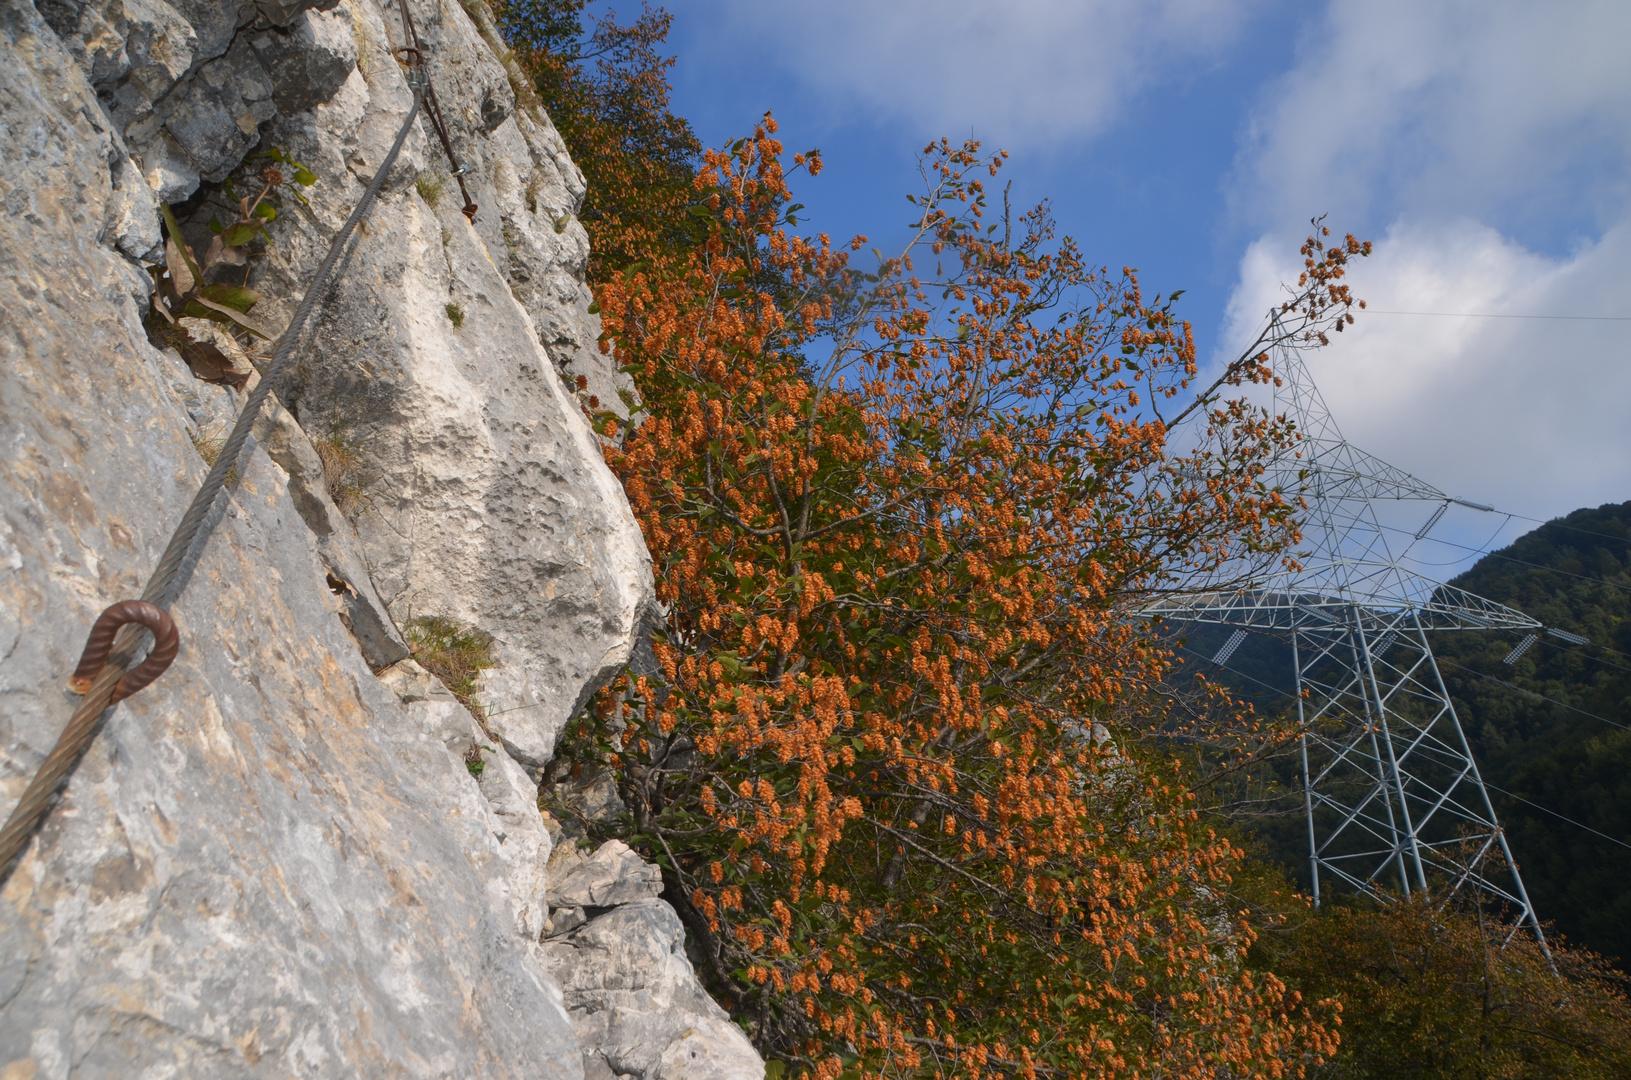 Klettern gibt Energie :)